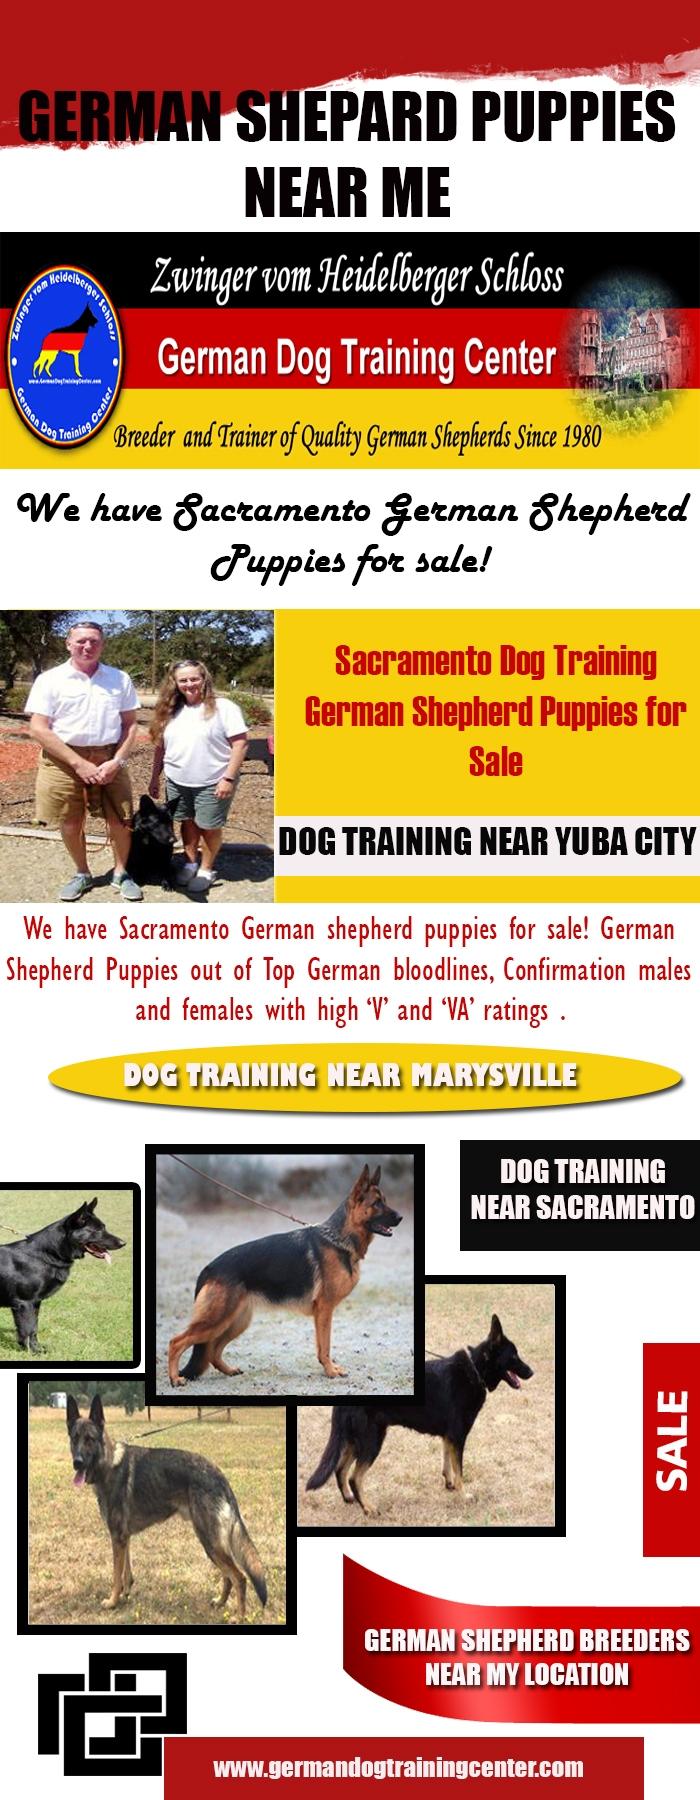 German Shepard Puppies Website - marysvilledogtraining | ello